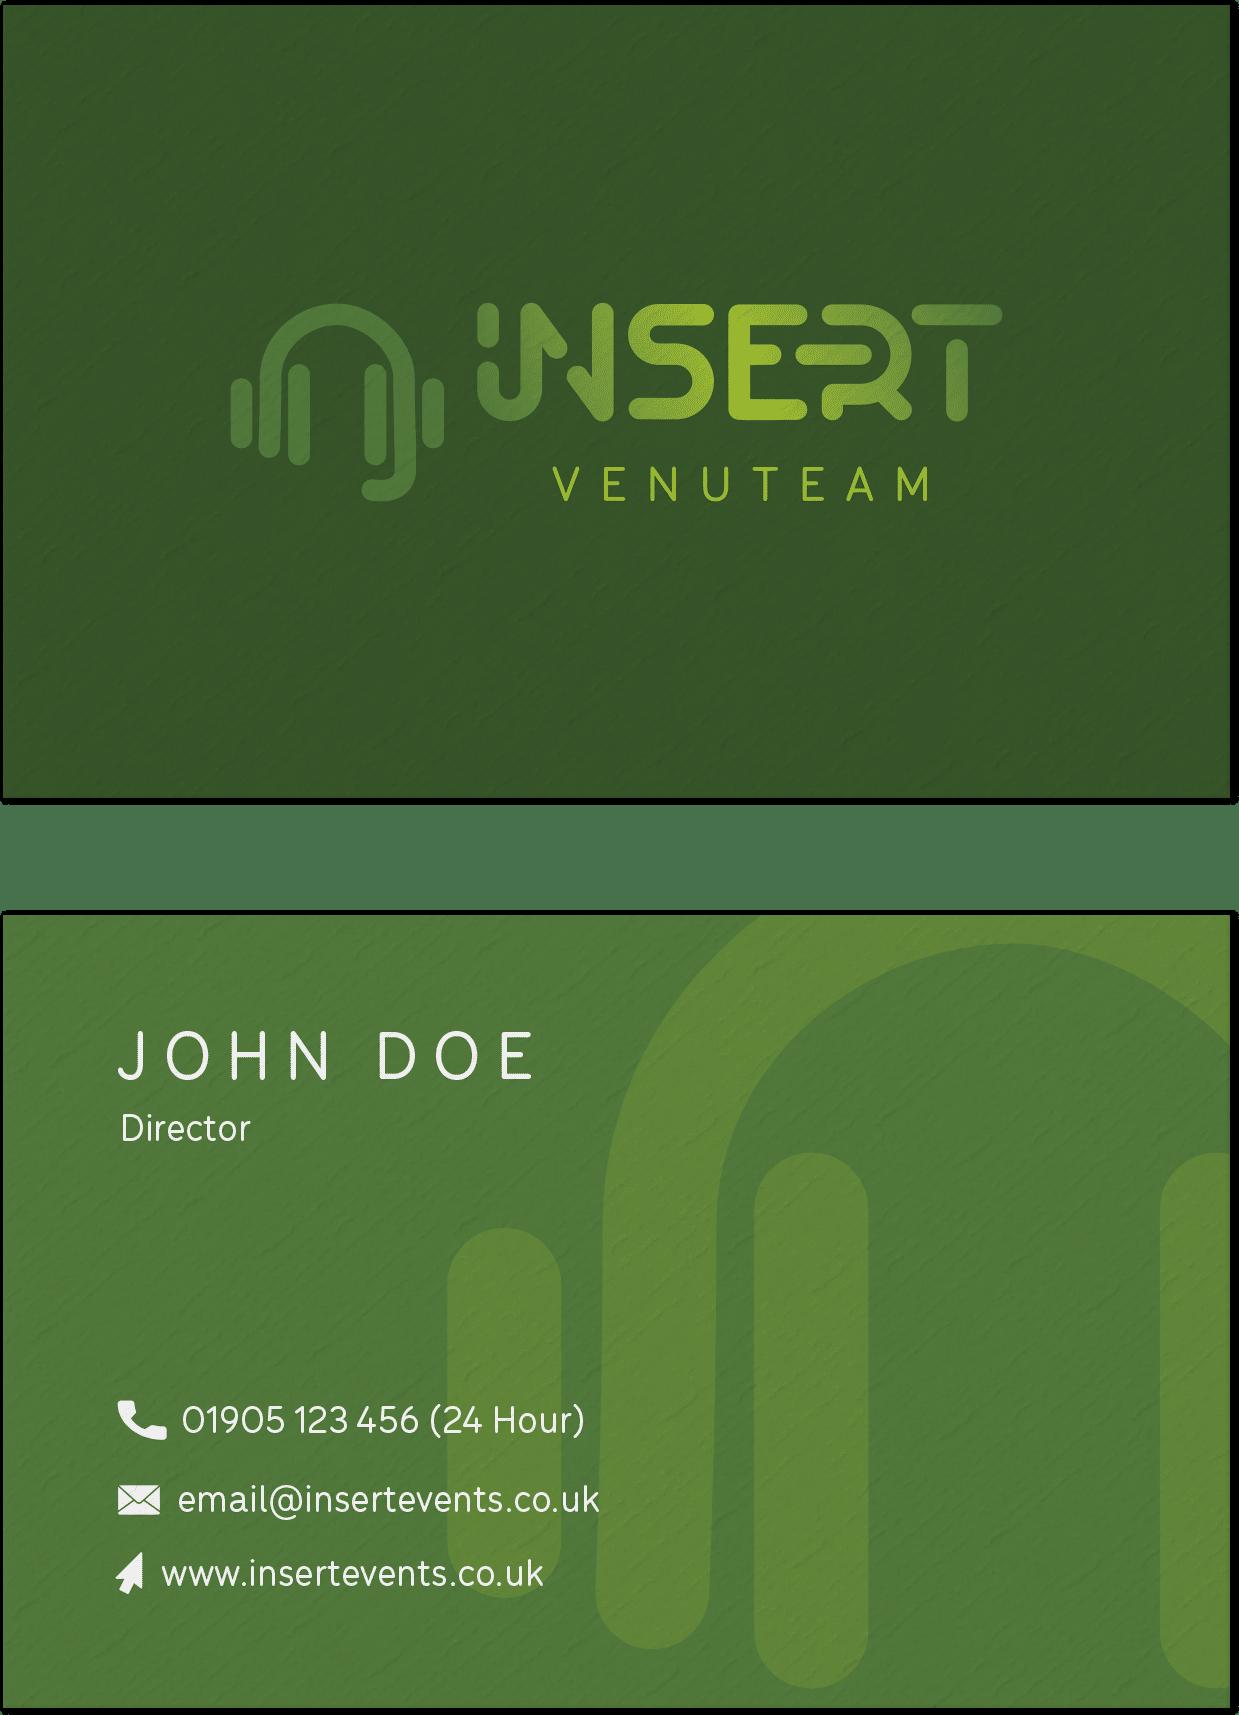 insert venuteam green business cards mockup